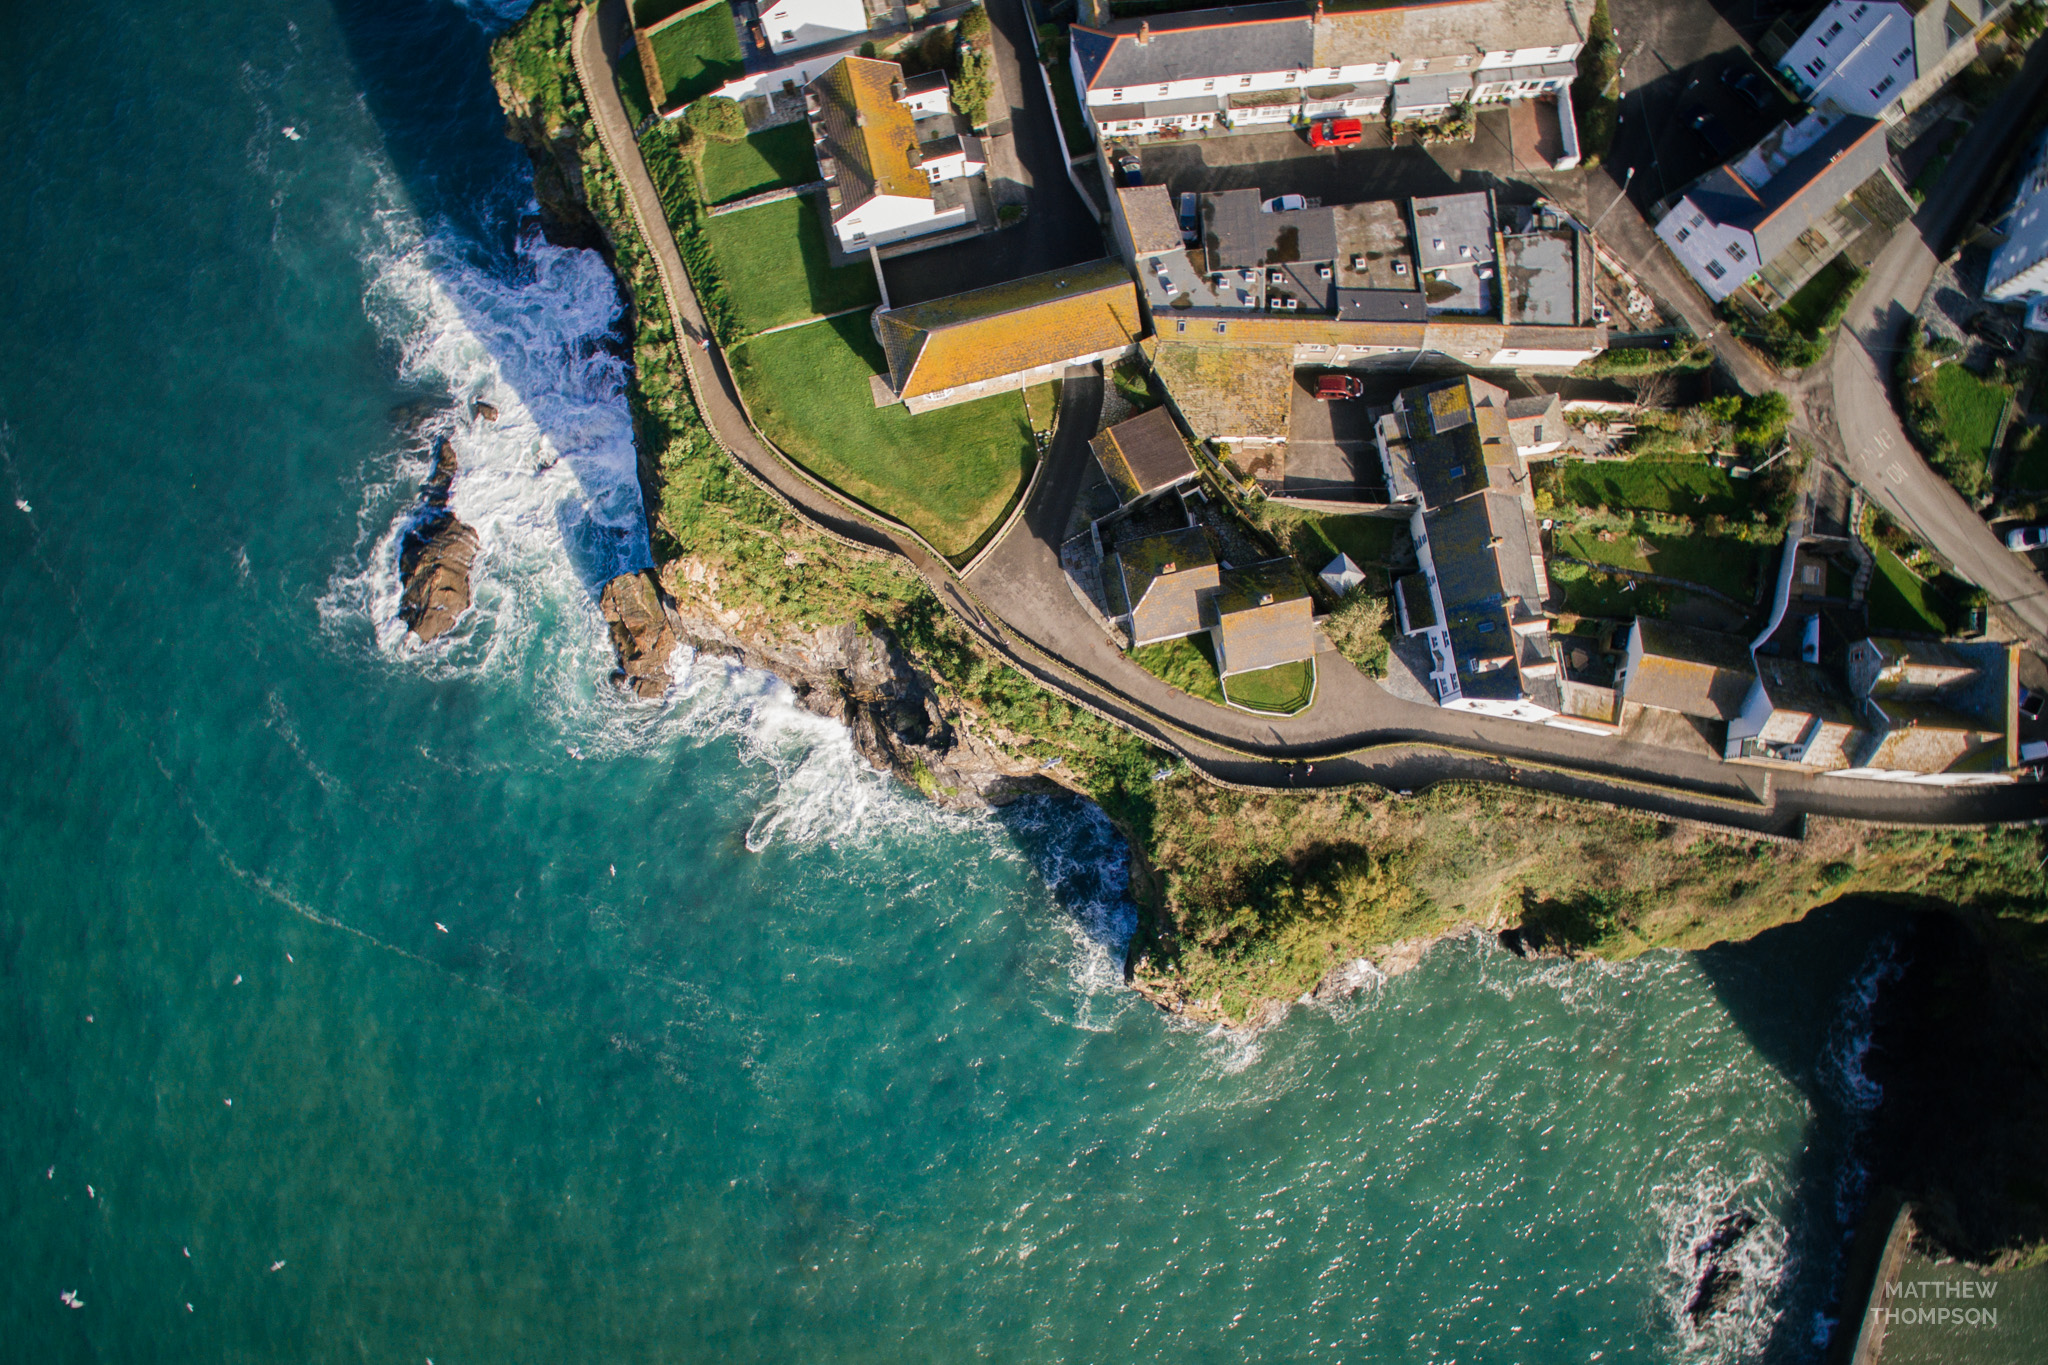 151107-Cornwall-Aerial-17-W.jpg